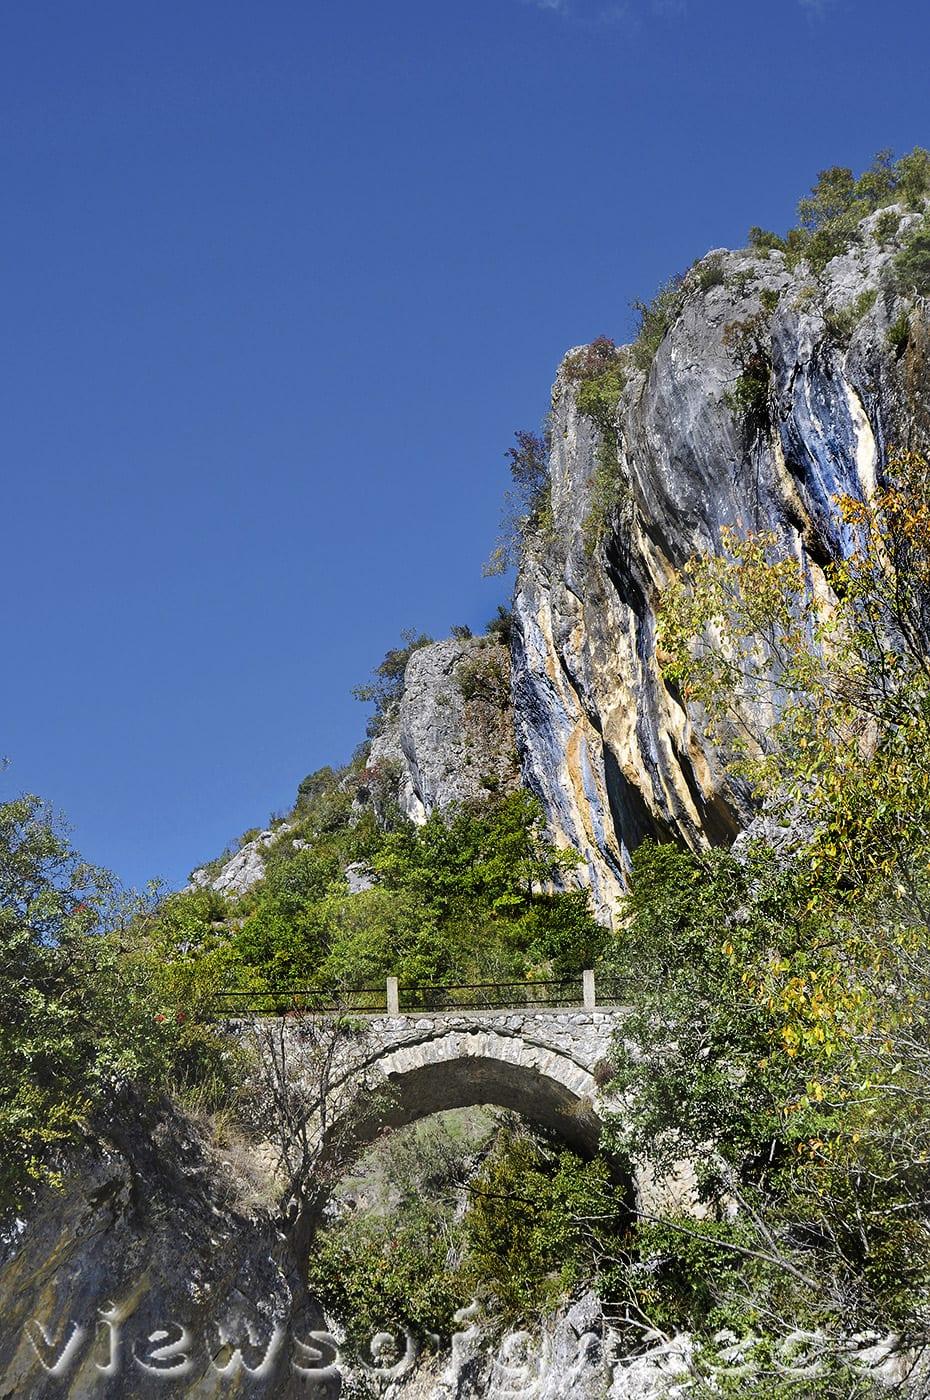 greece, mountain, outdoor, nature, greek, canyon, pindos, gorge, river, pindus, trekking, Όρλιακας, Γρεβενά, εθνικό πάρκο πίνδου, γεφύρια, Αζίζ Αγά, Πορτίτσα, Σπήλαιο,